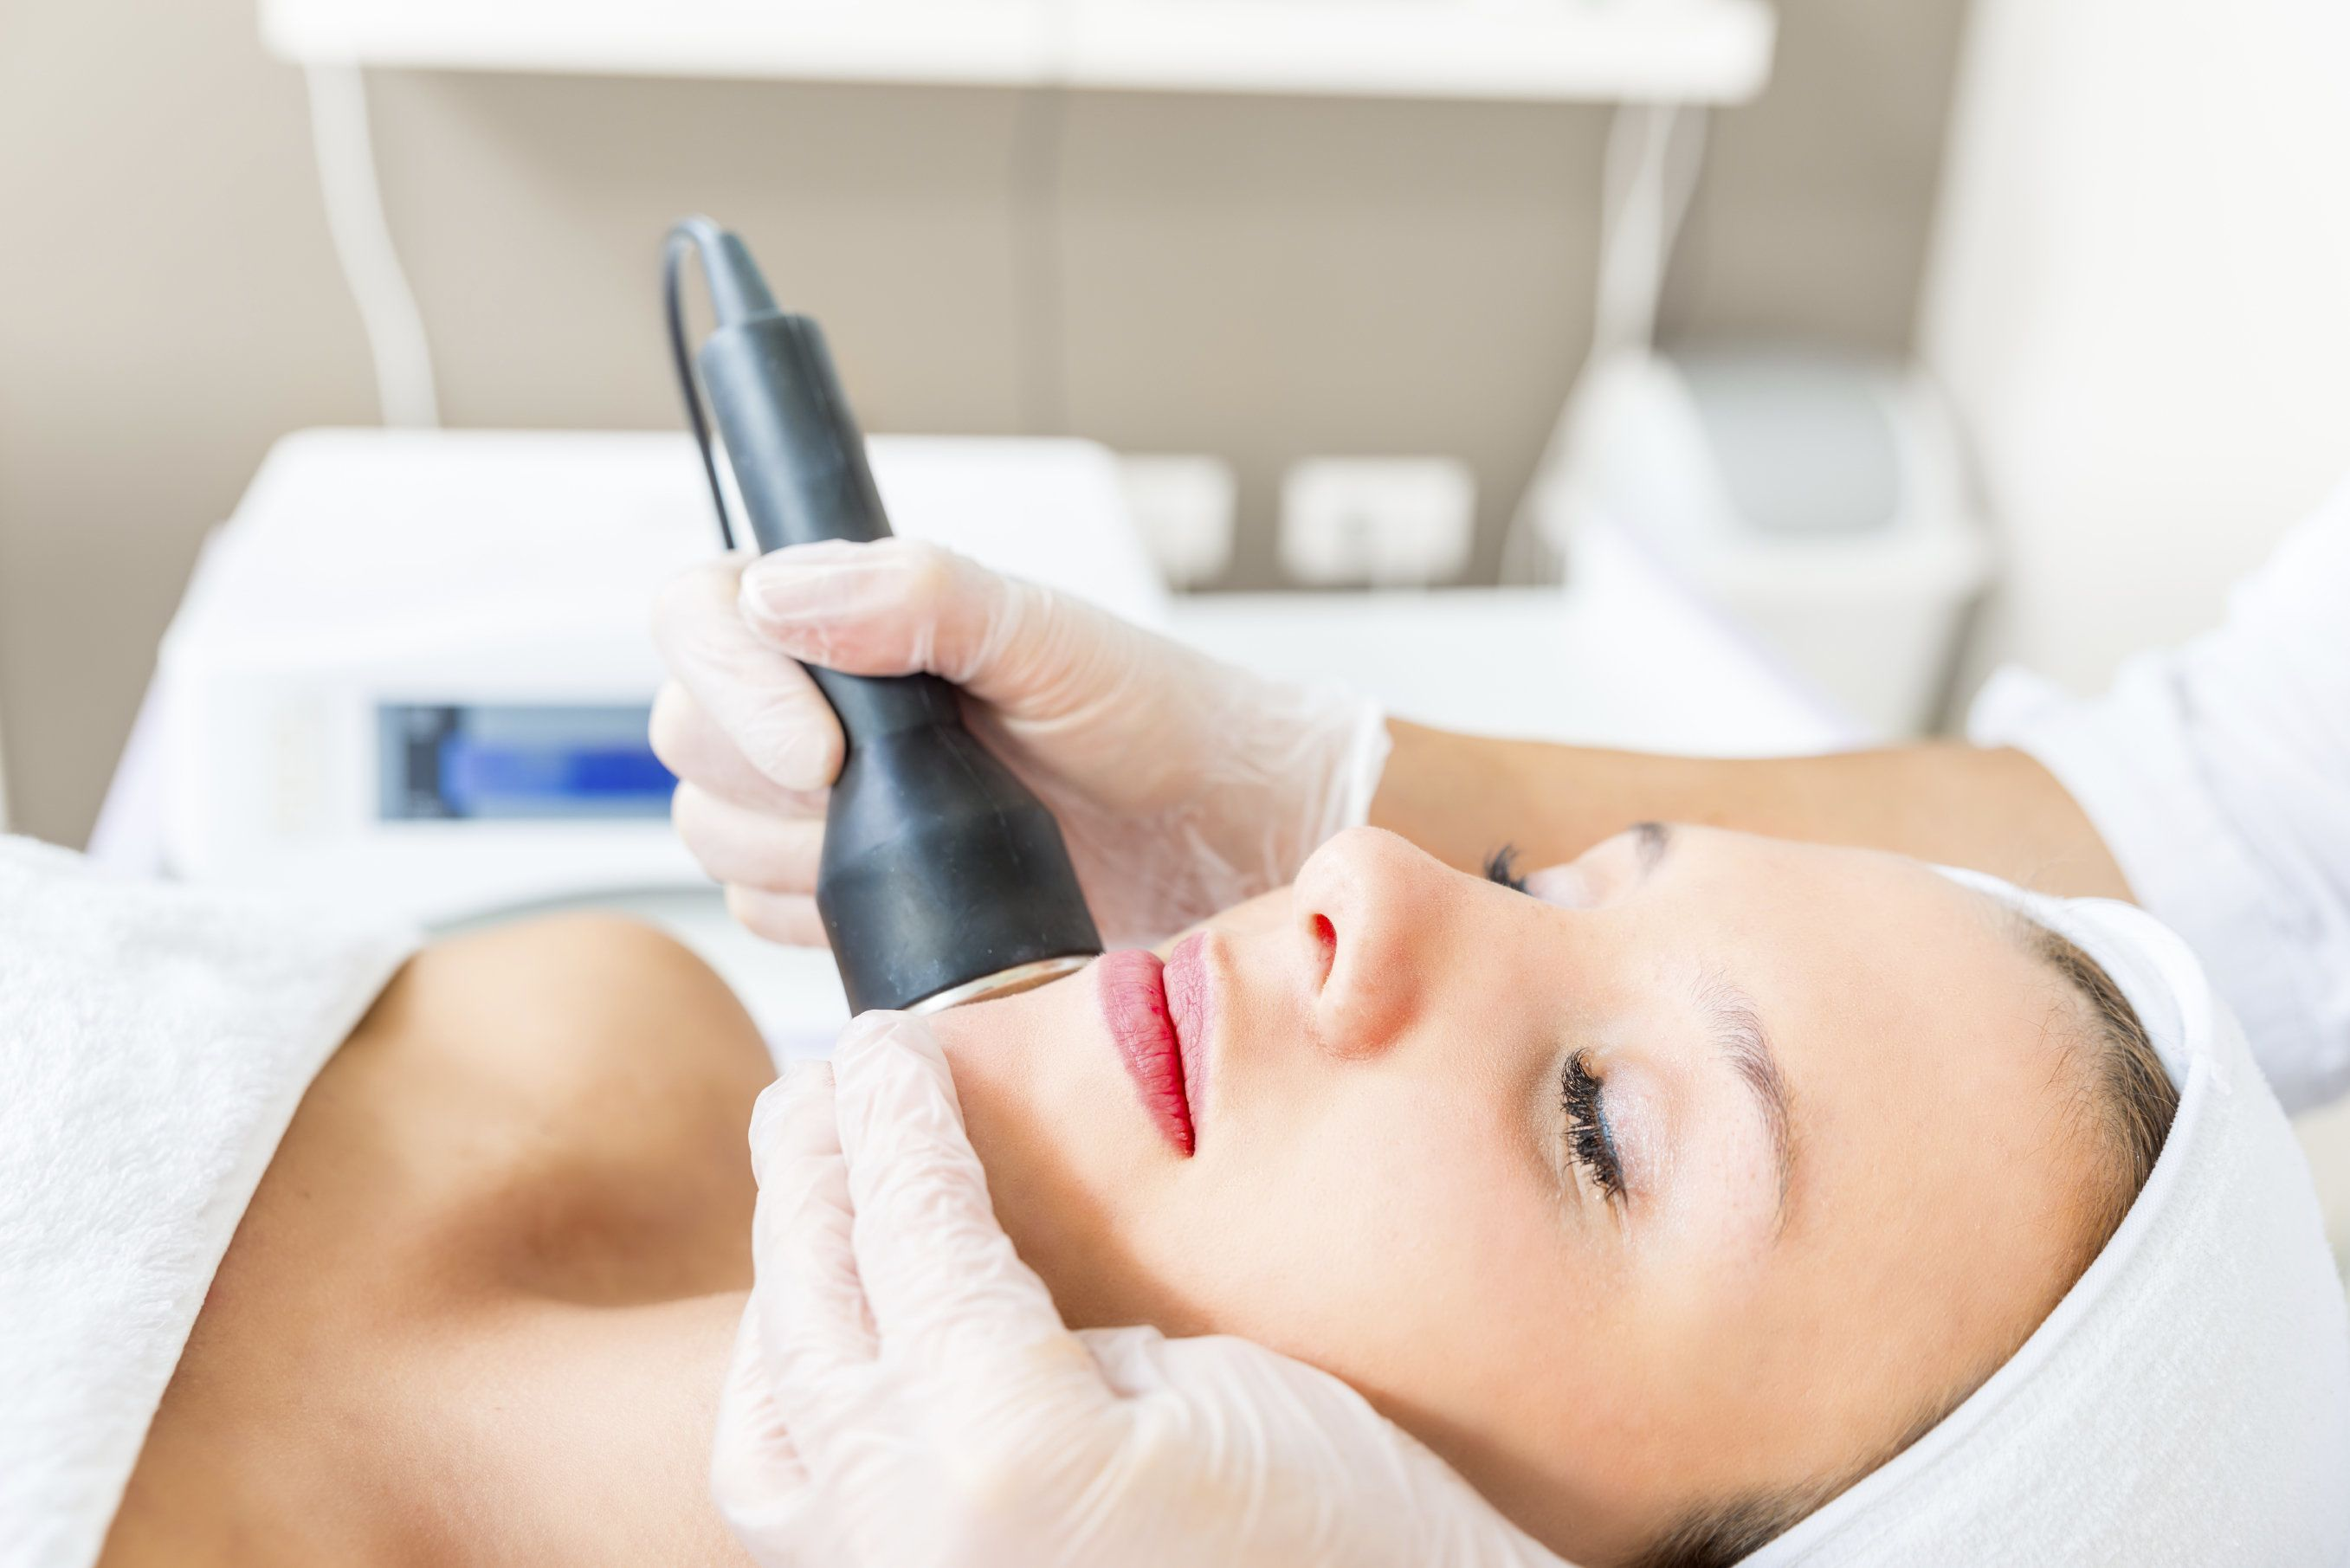 Woman receiving laser facial treatment